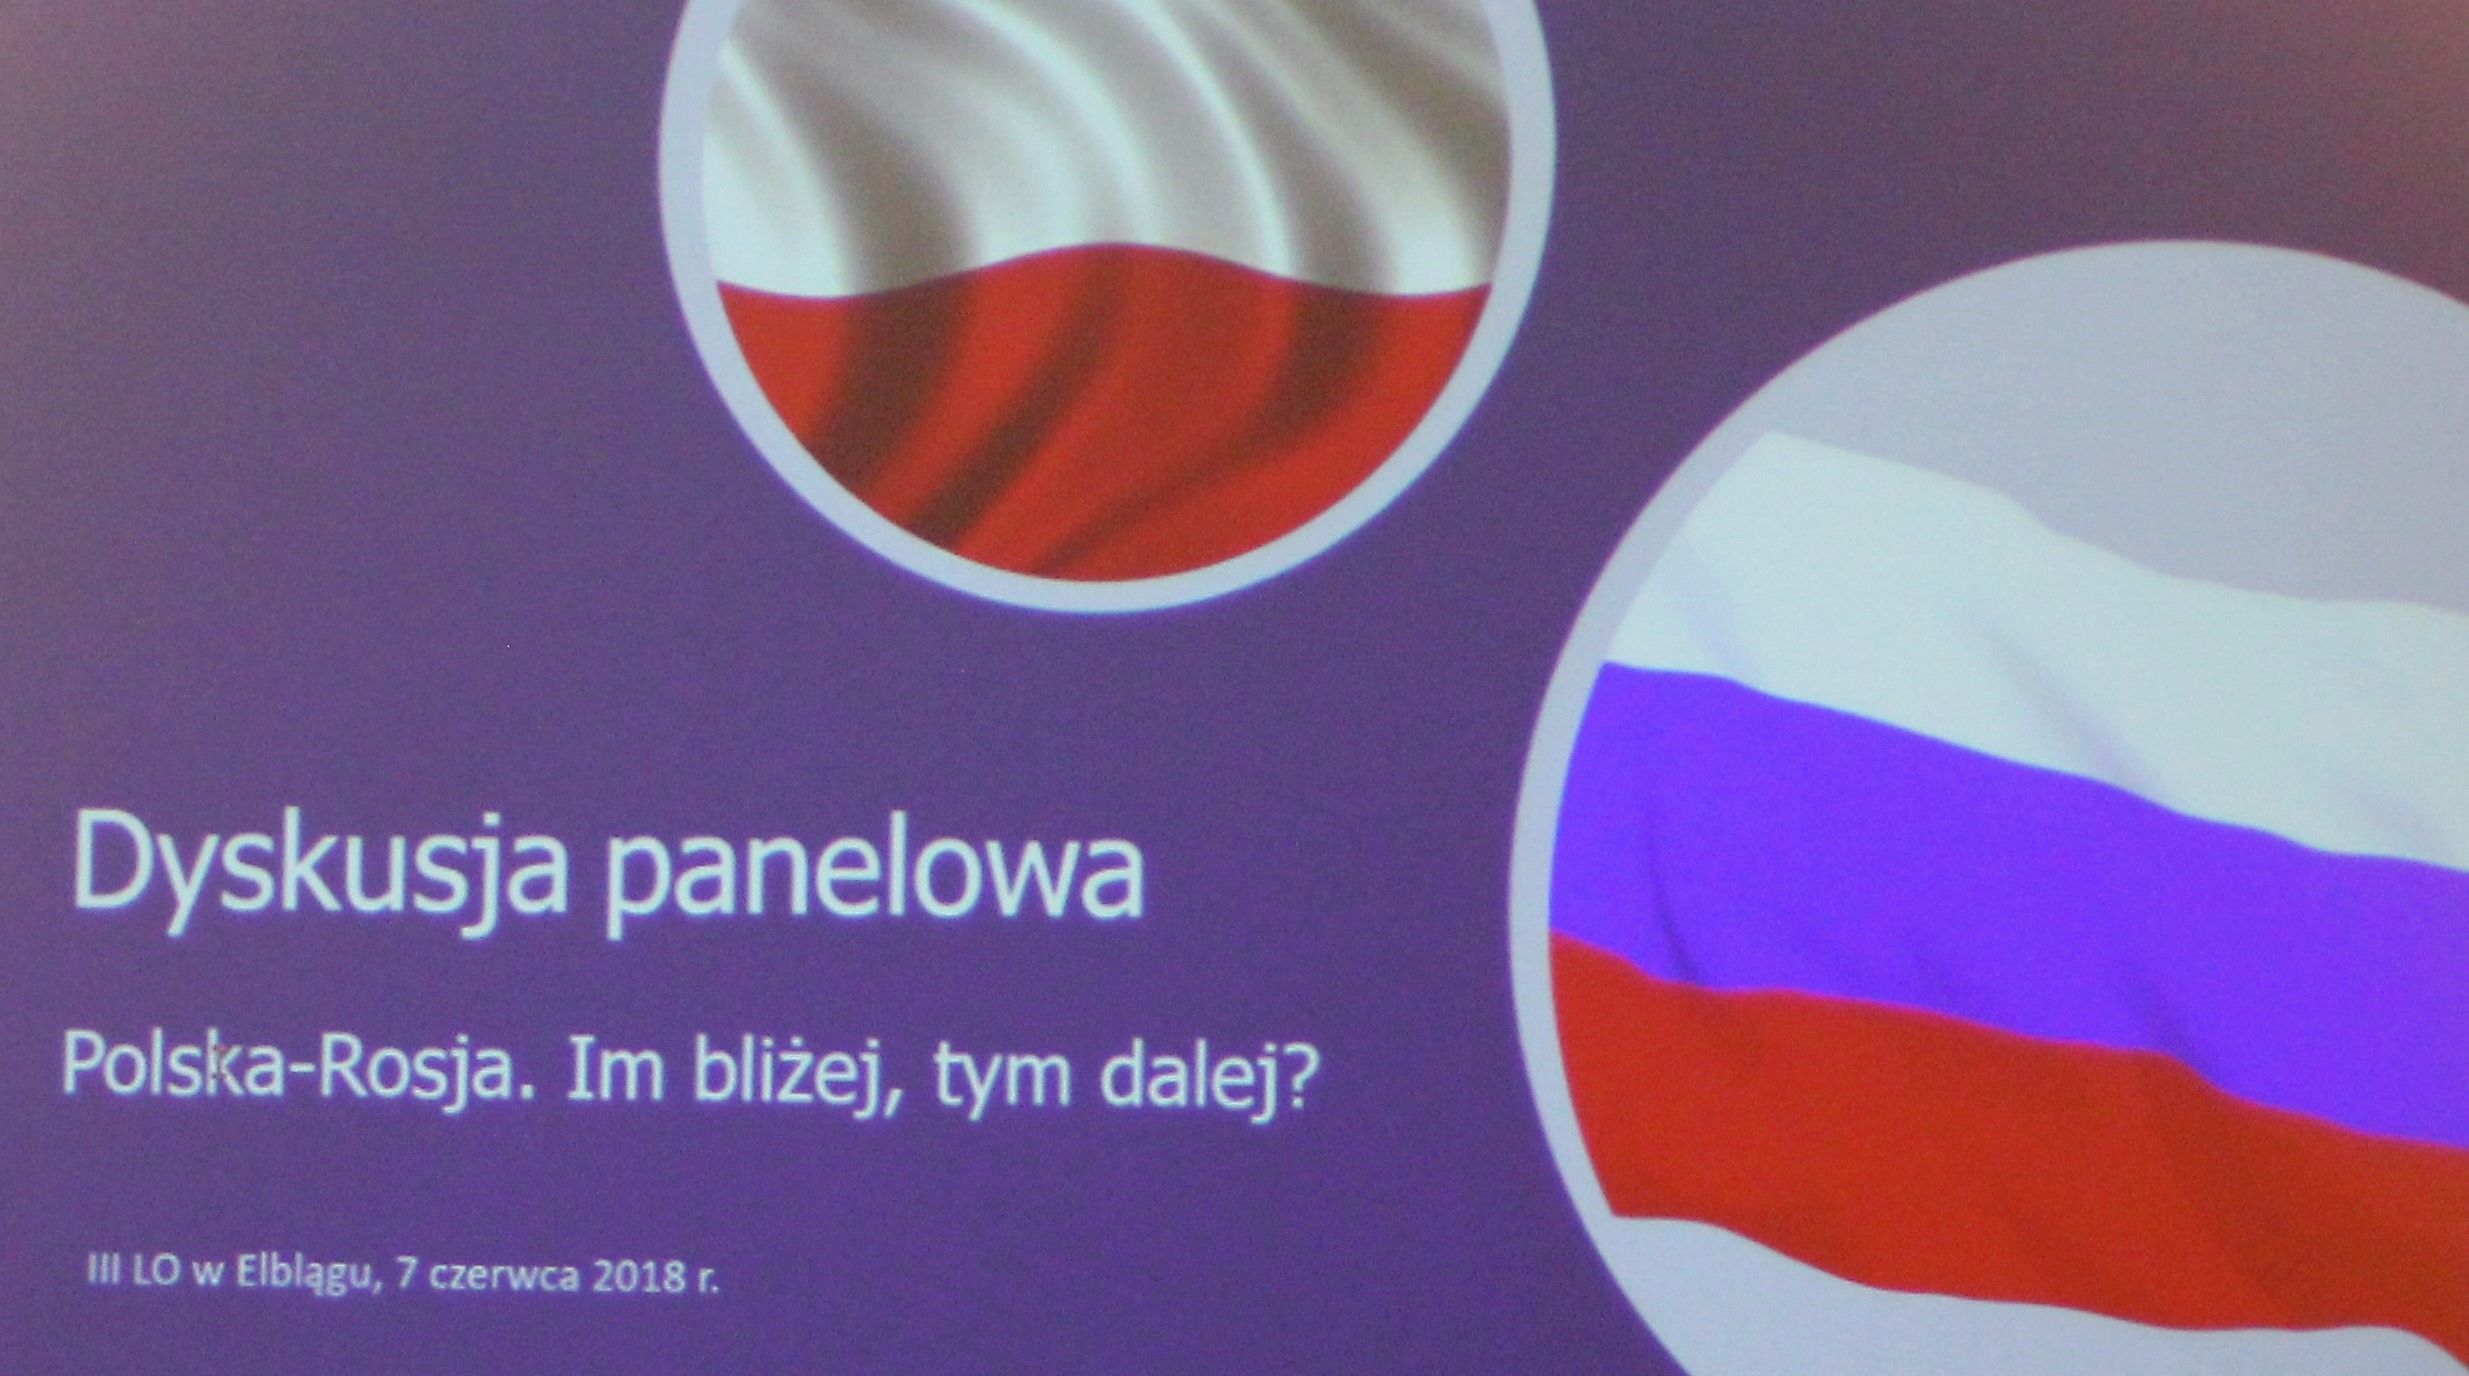 Dyskusja w Elblągu